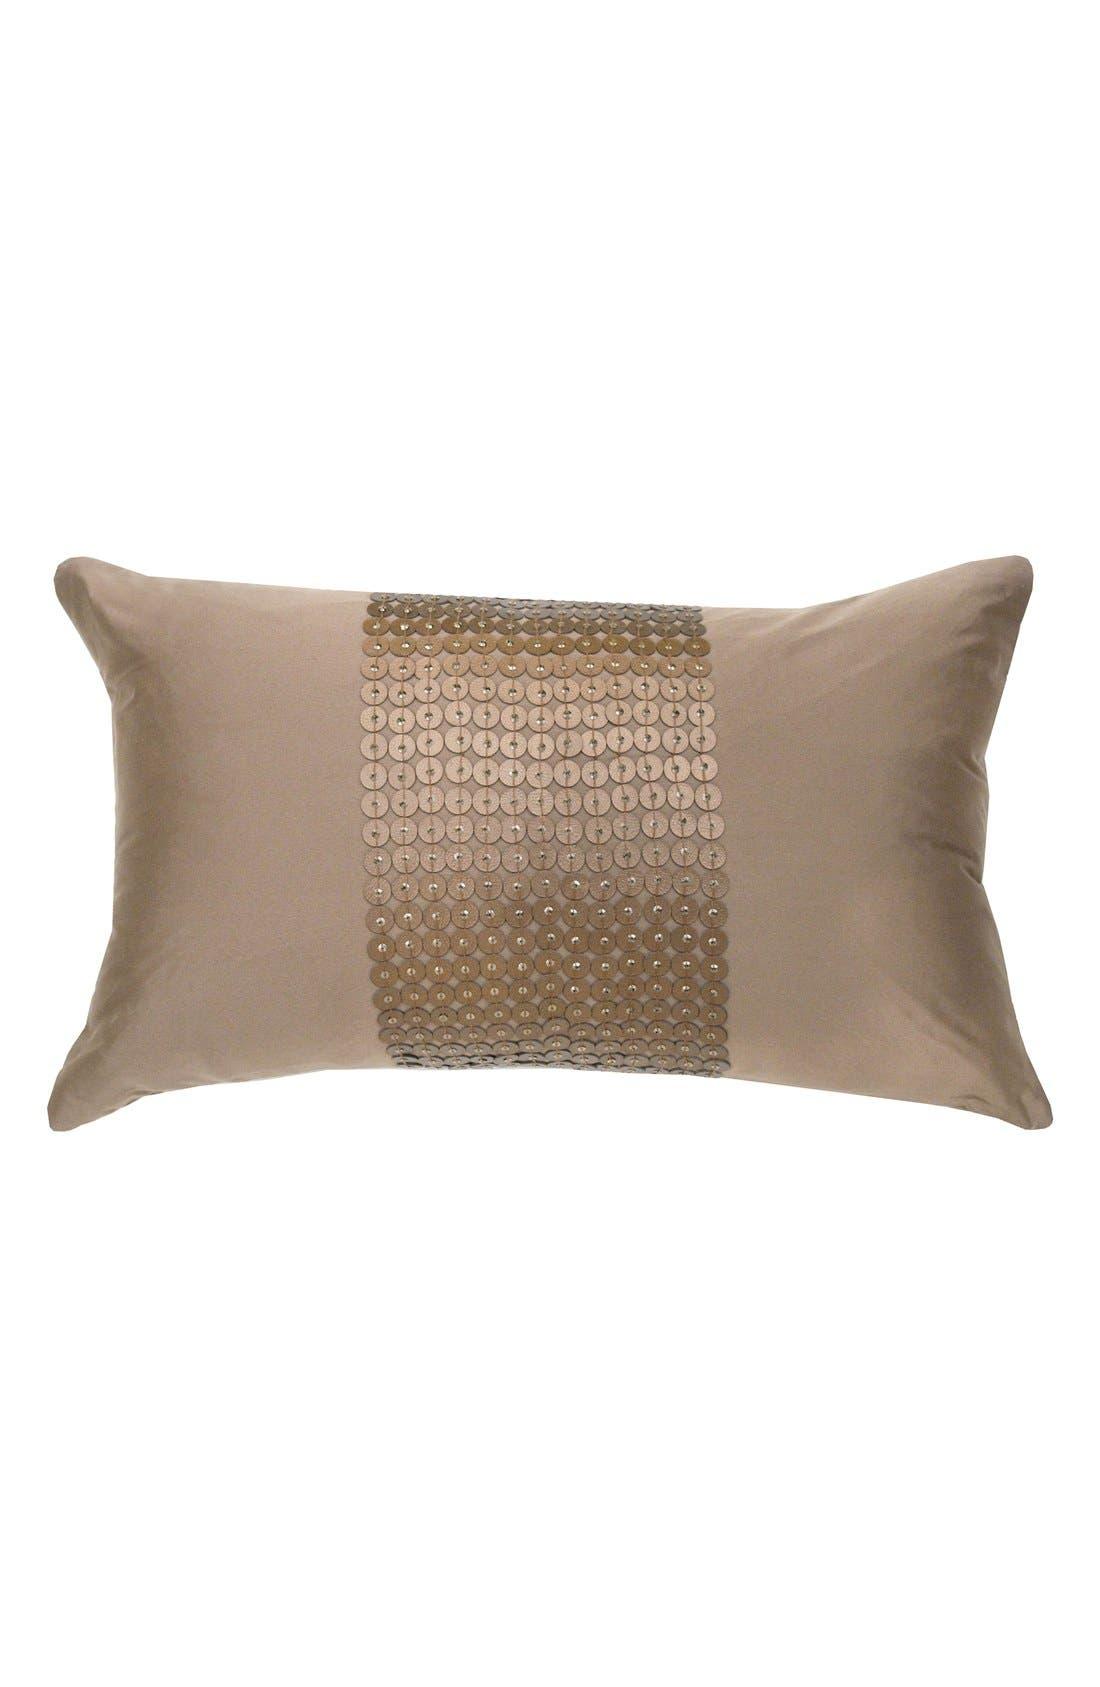 Catherine Malandrino Metallic Accent Pillow